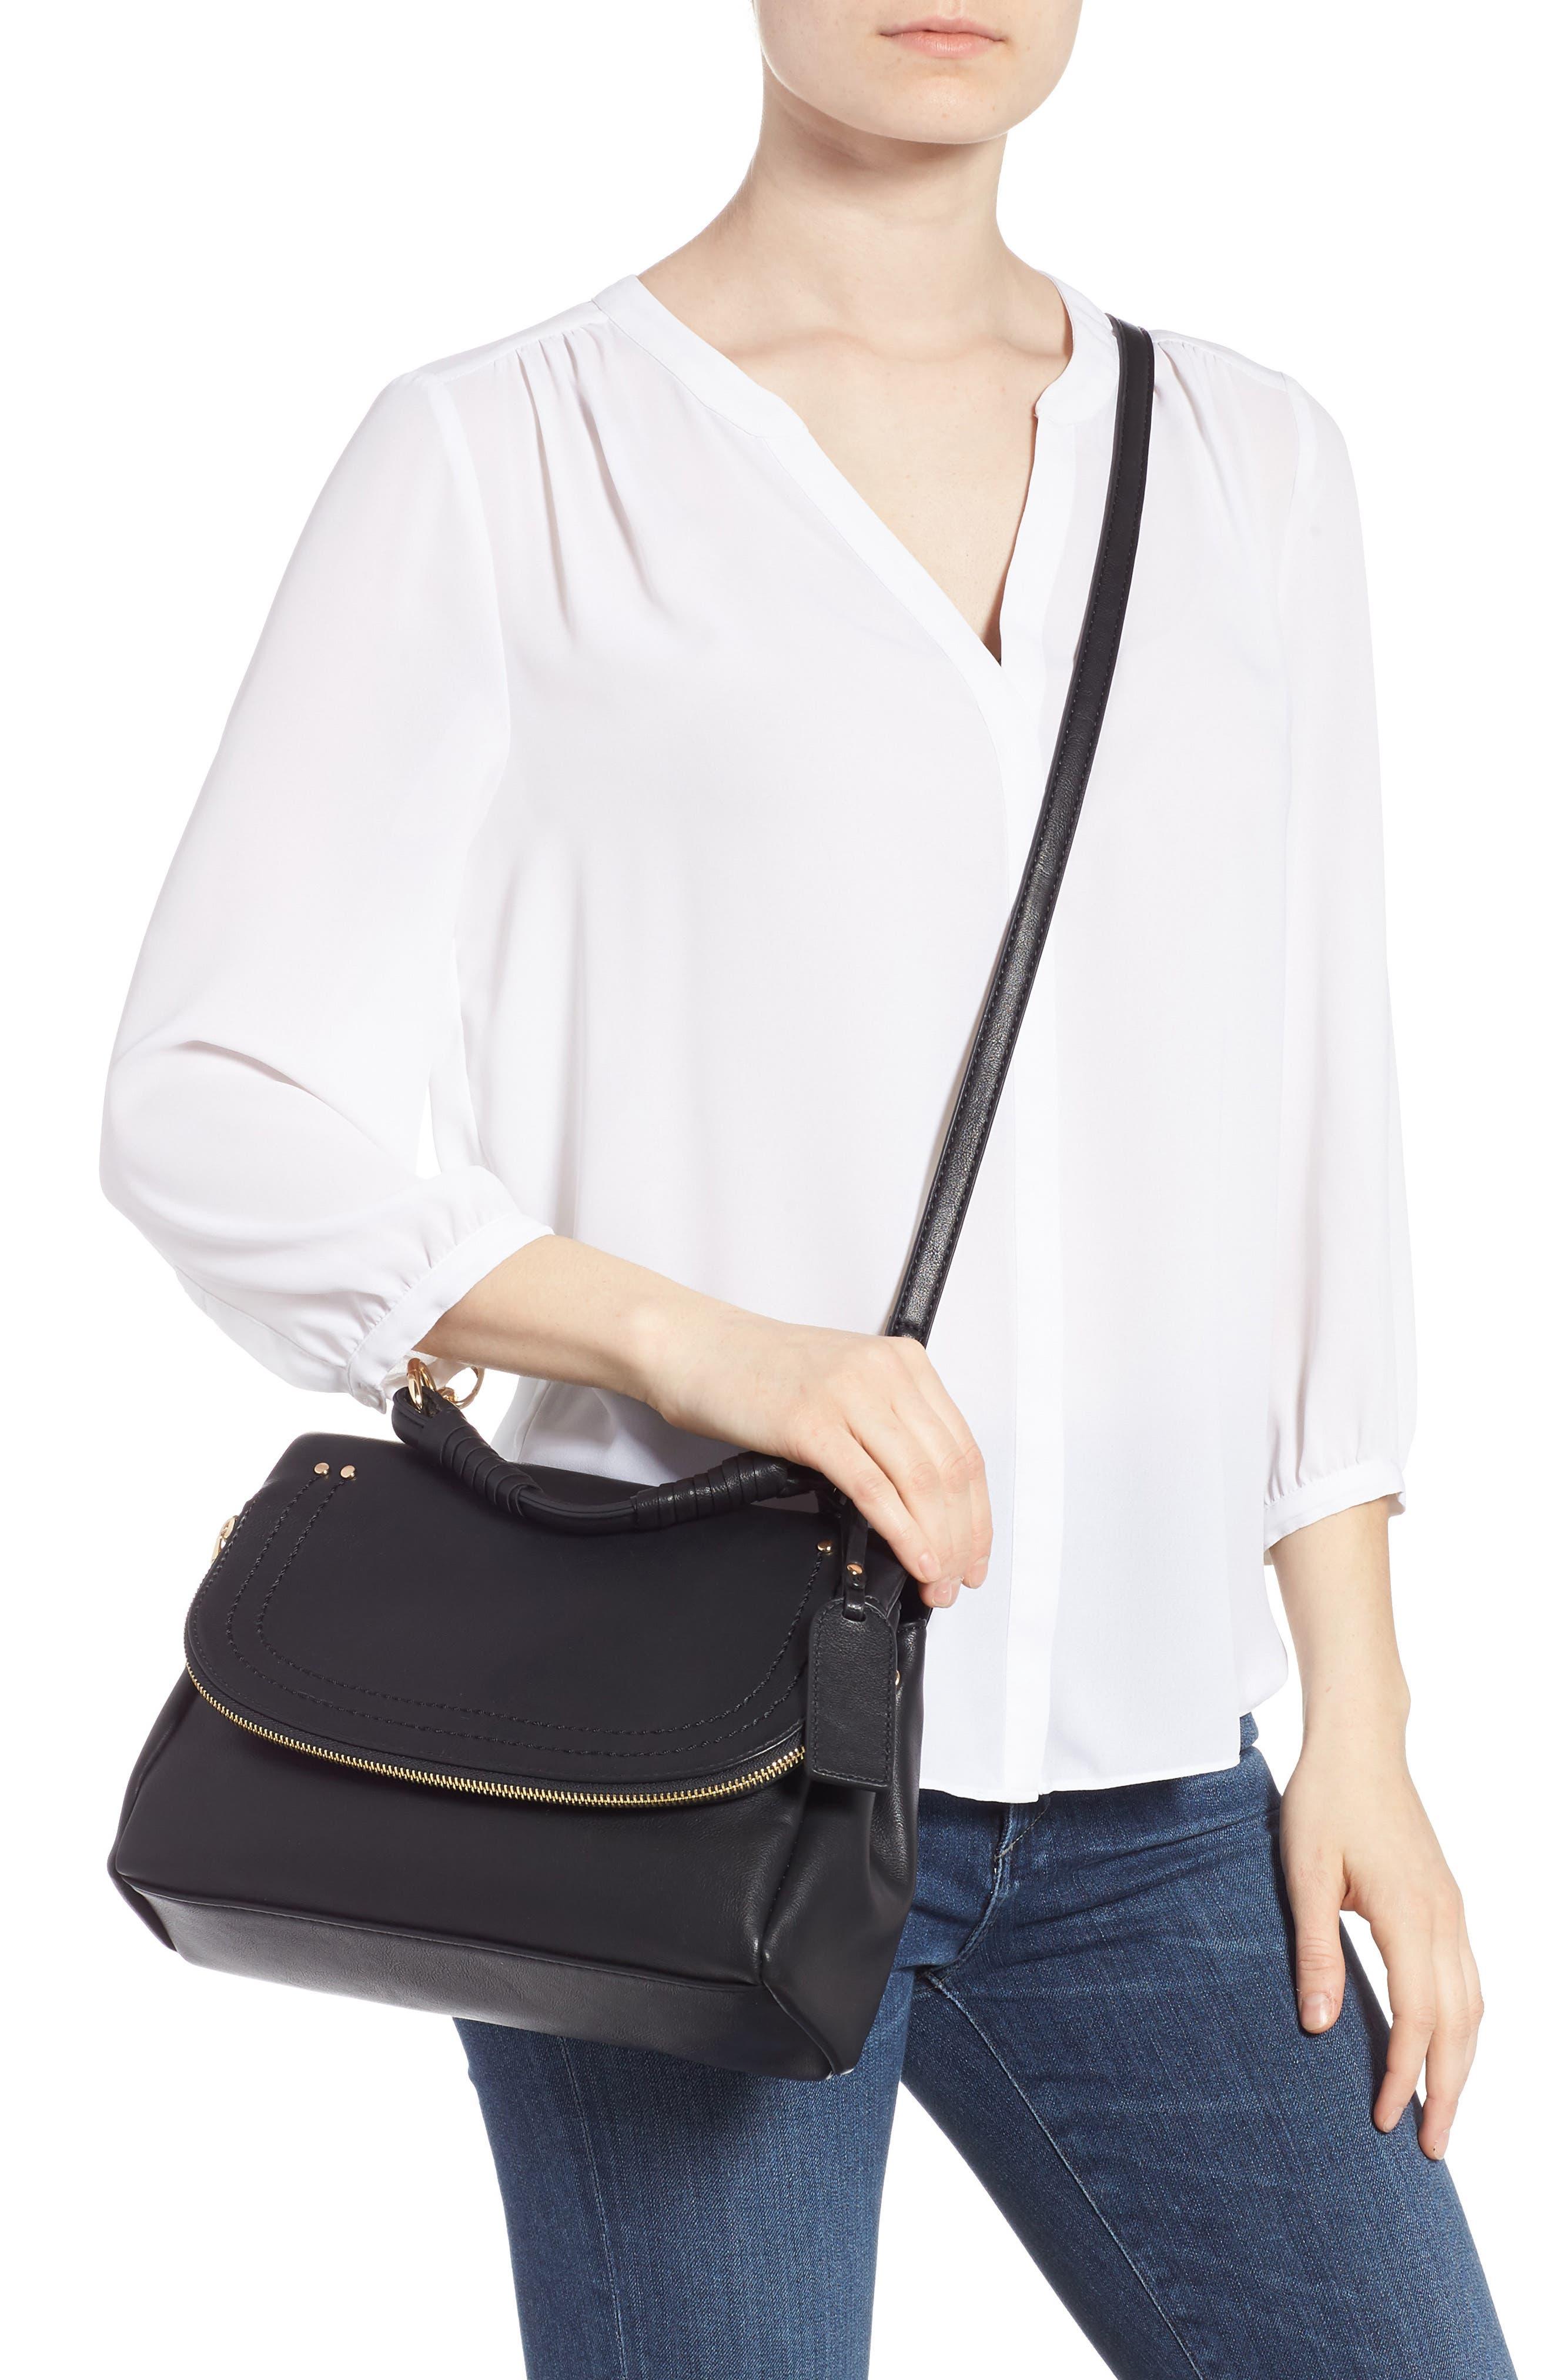 Rubie Faux Leather Crossbody Bag,                             Alternate thumbnail 2, color,                             BLACK